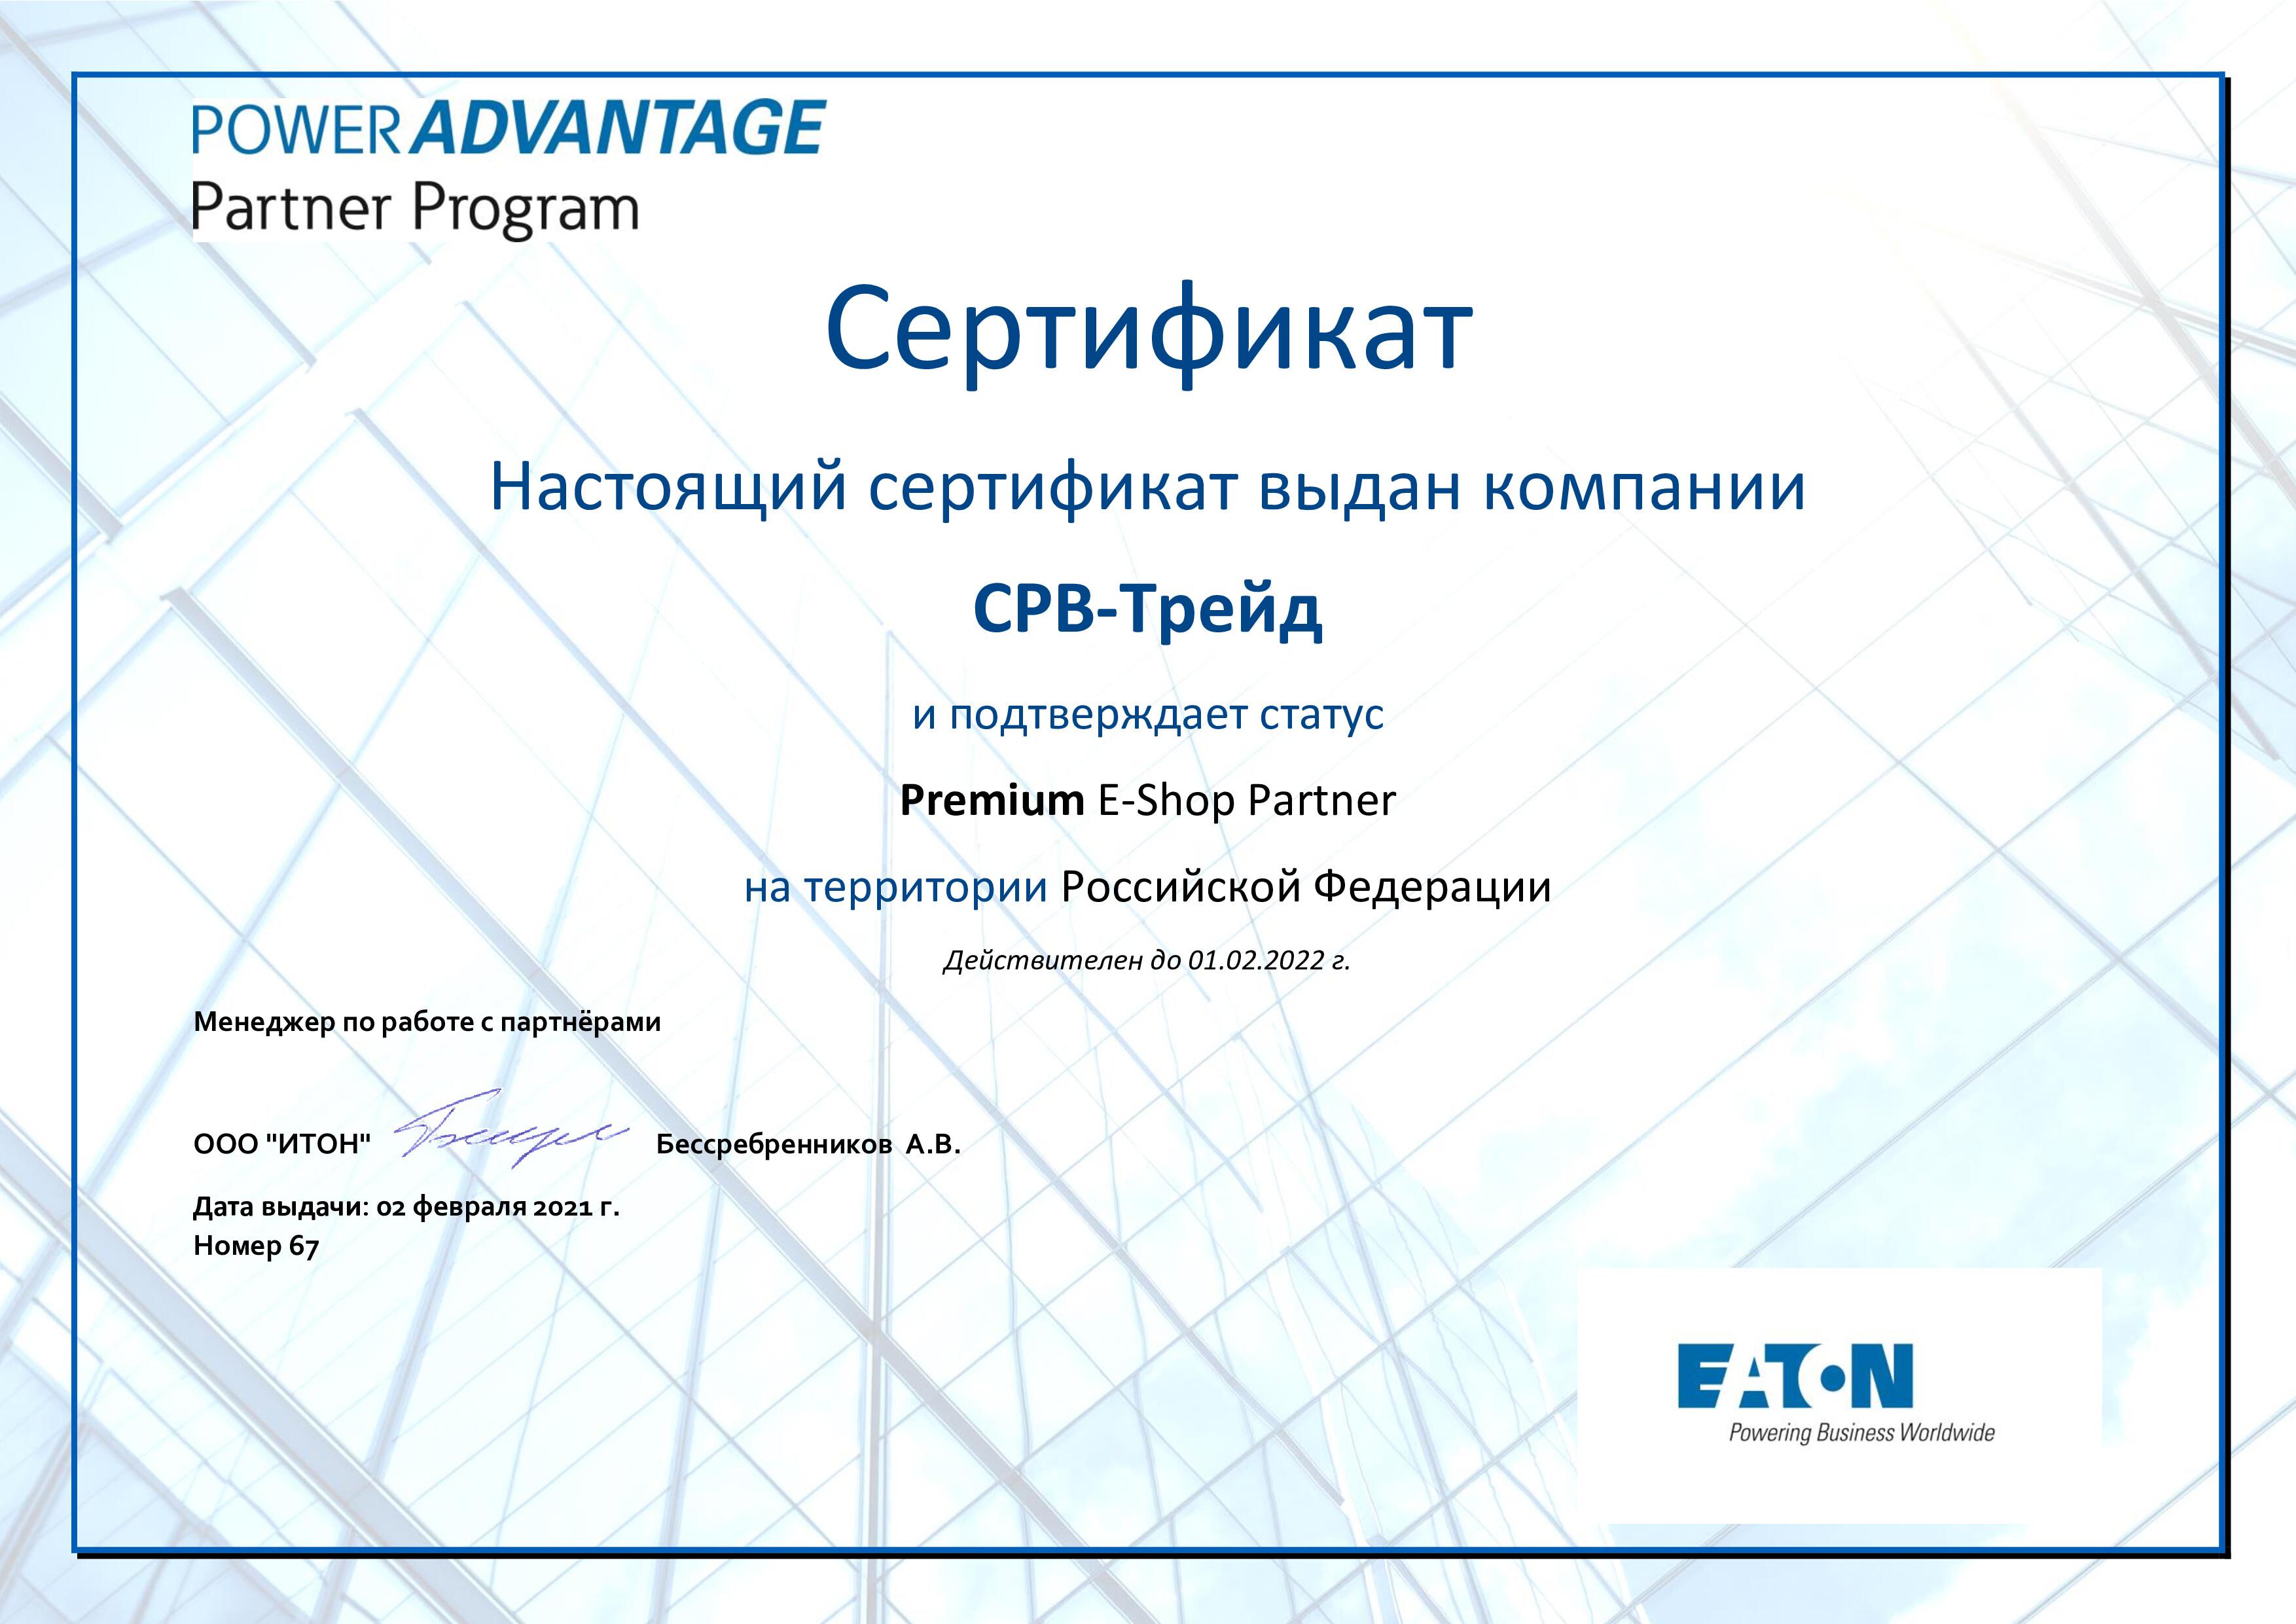 Сертификат партнера Eaton